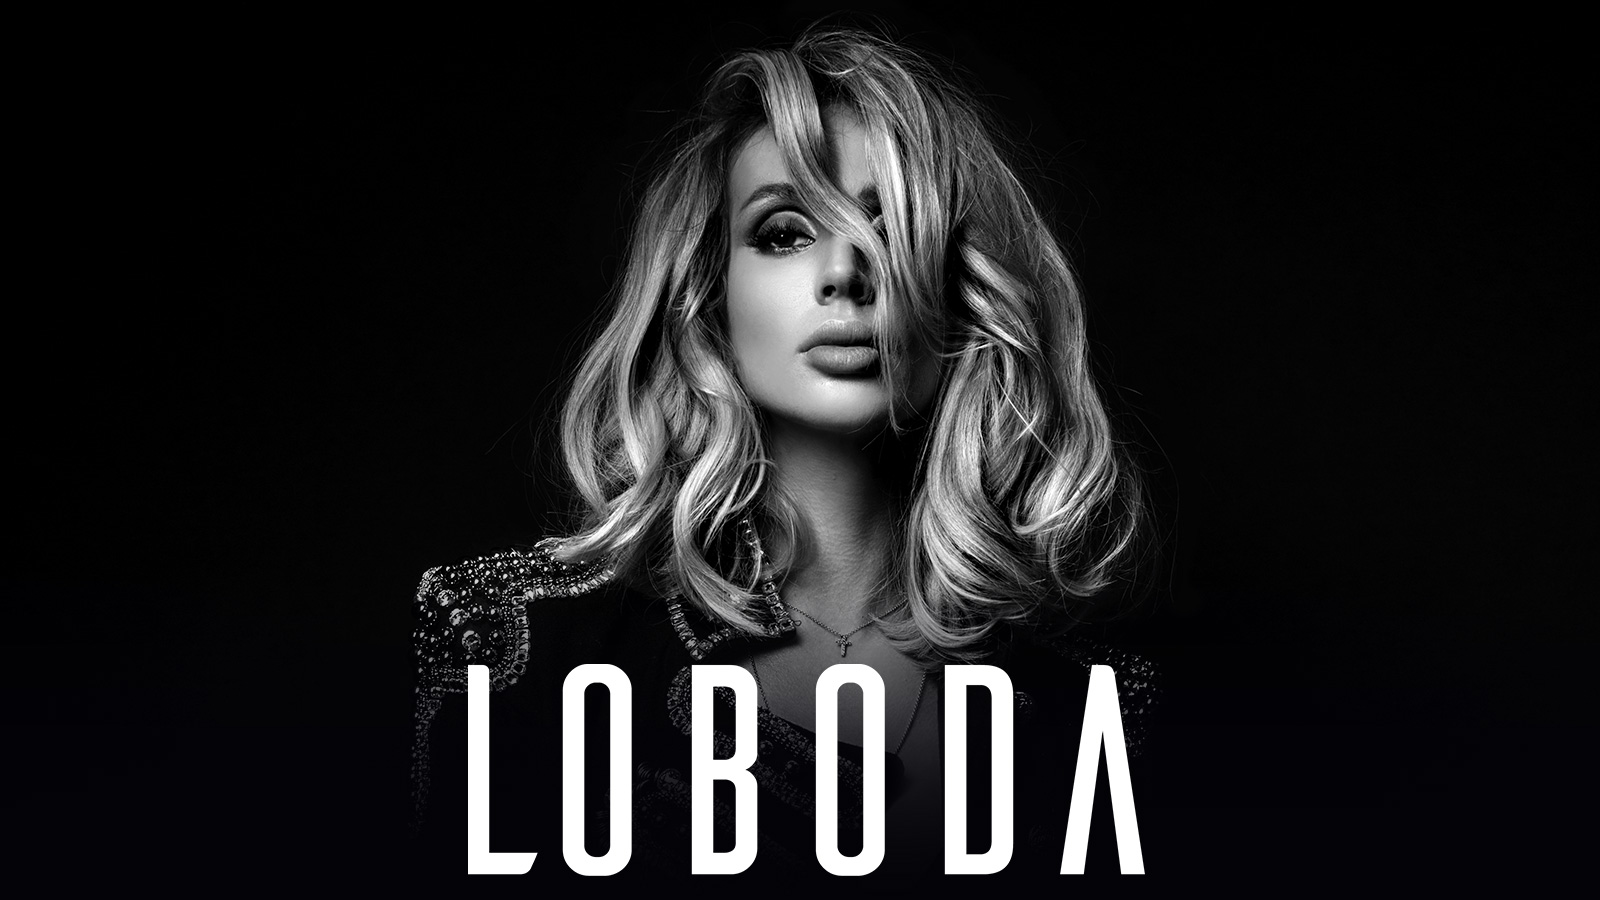 Loboda / ЛОБОДА